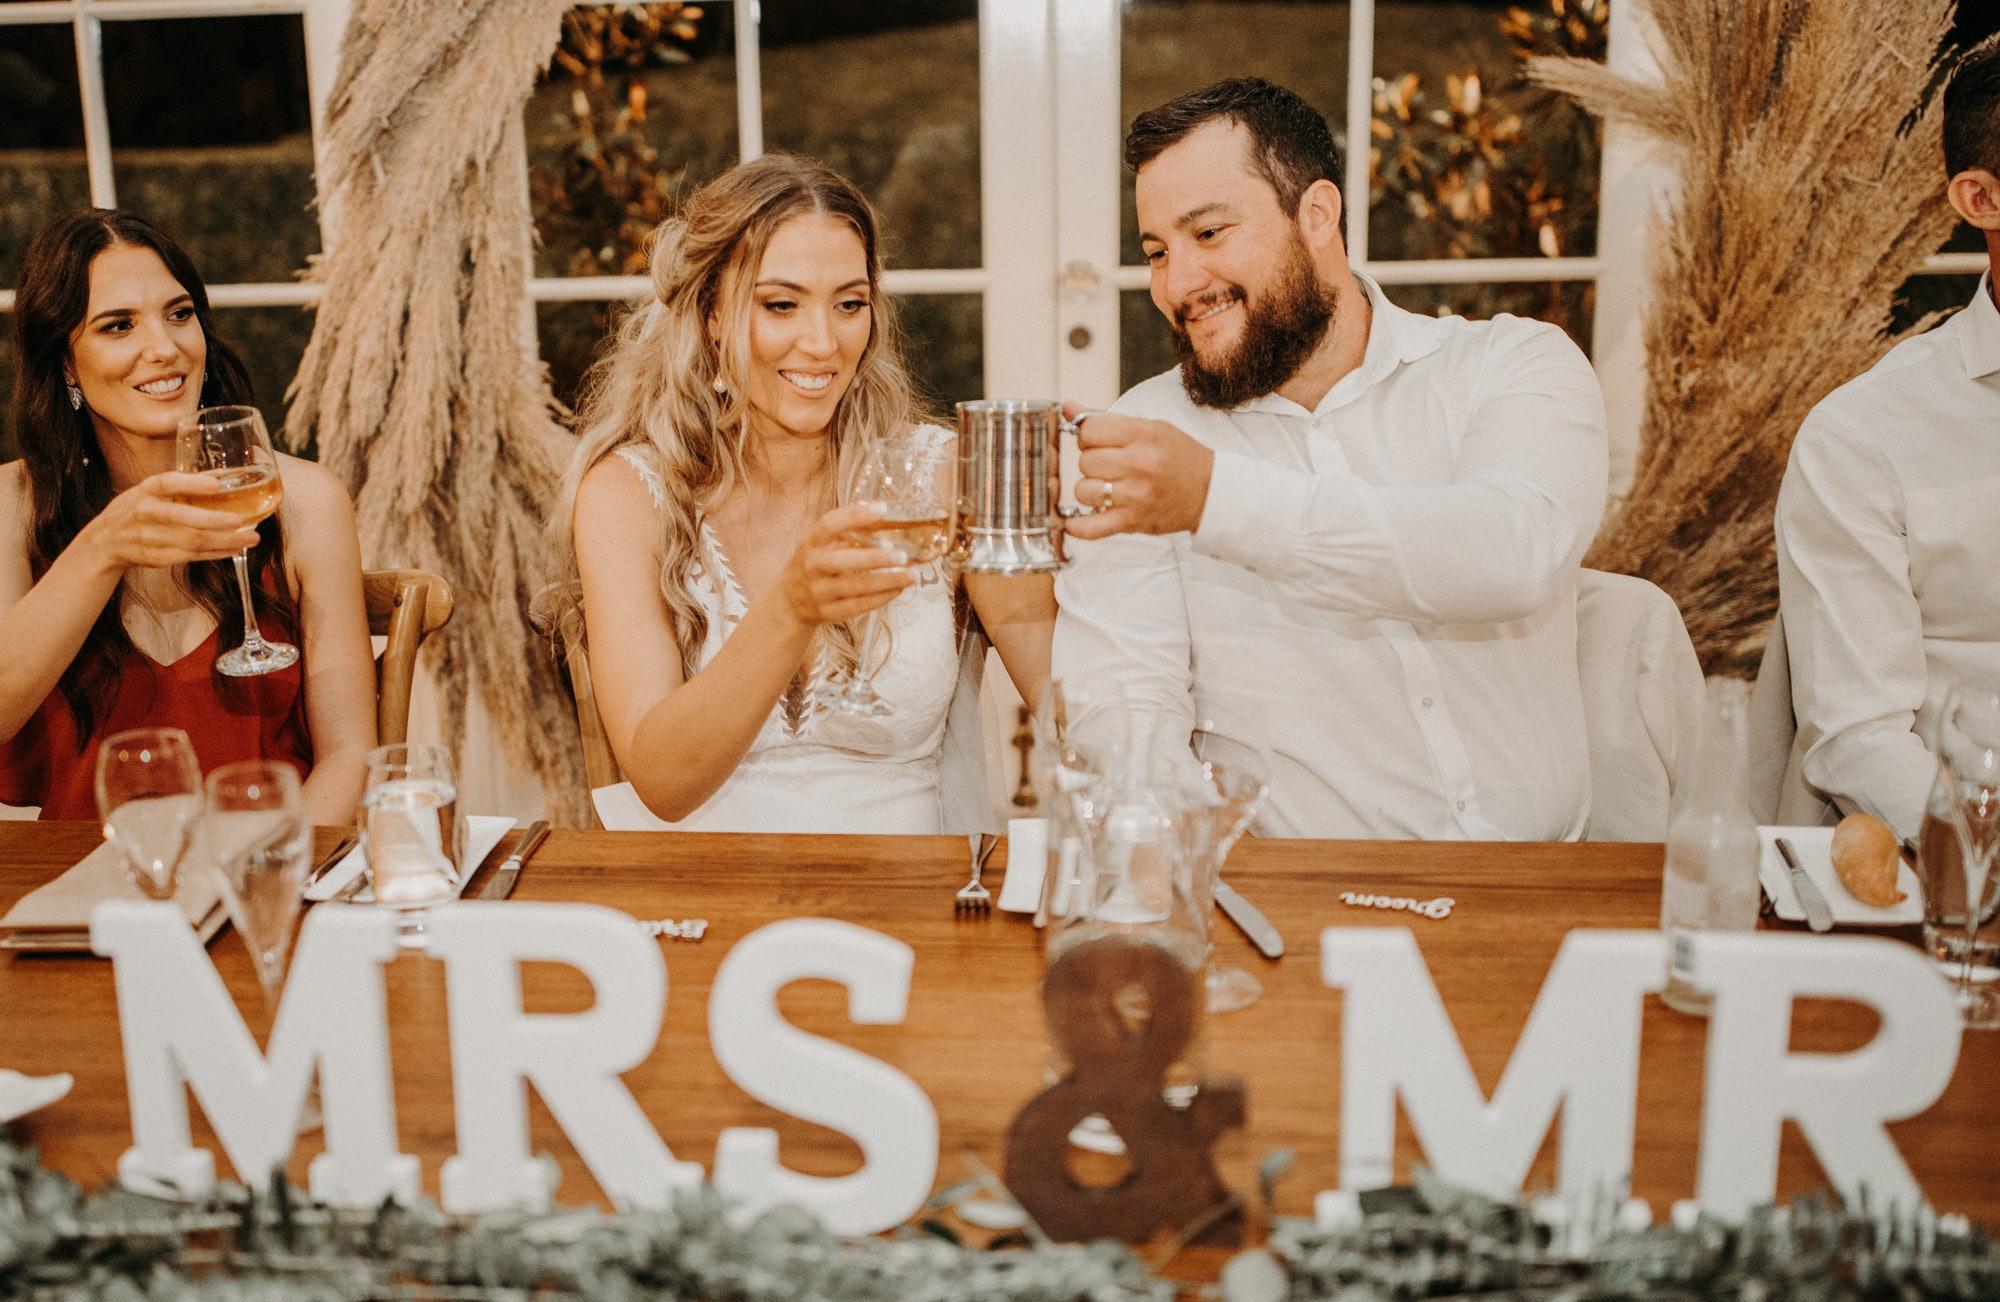 Bride and groom toasting drinks